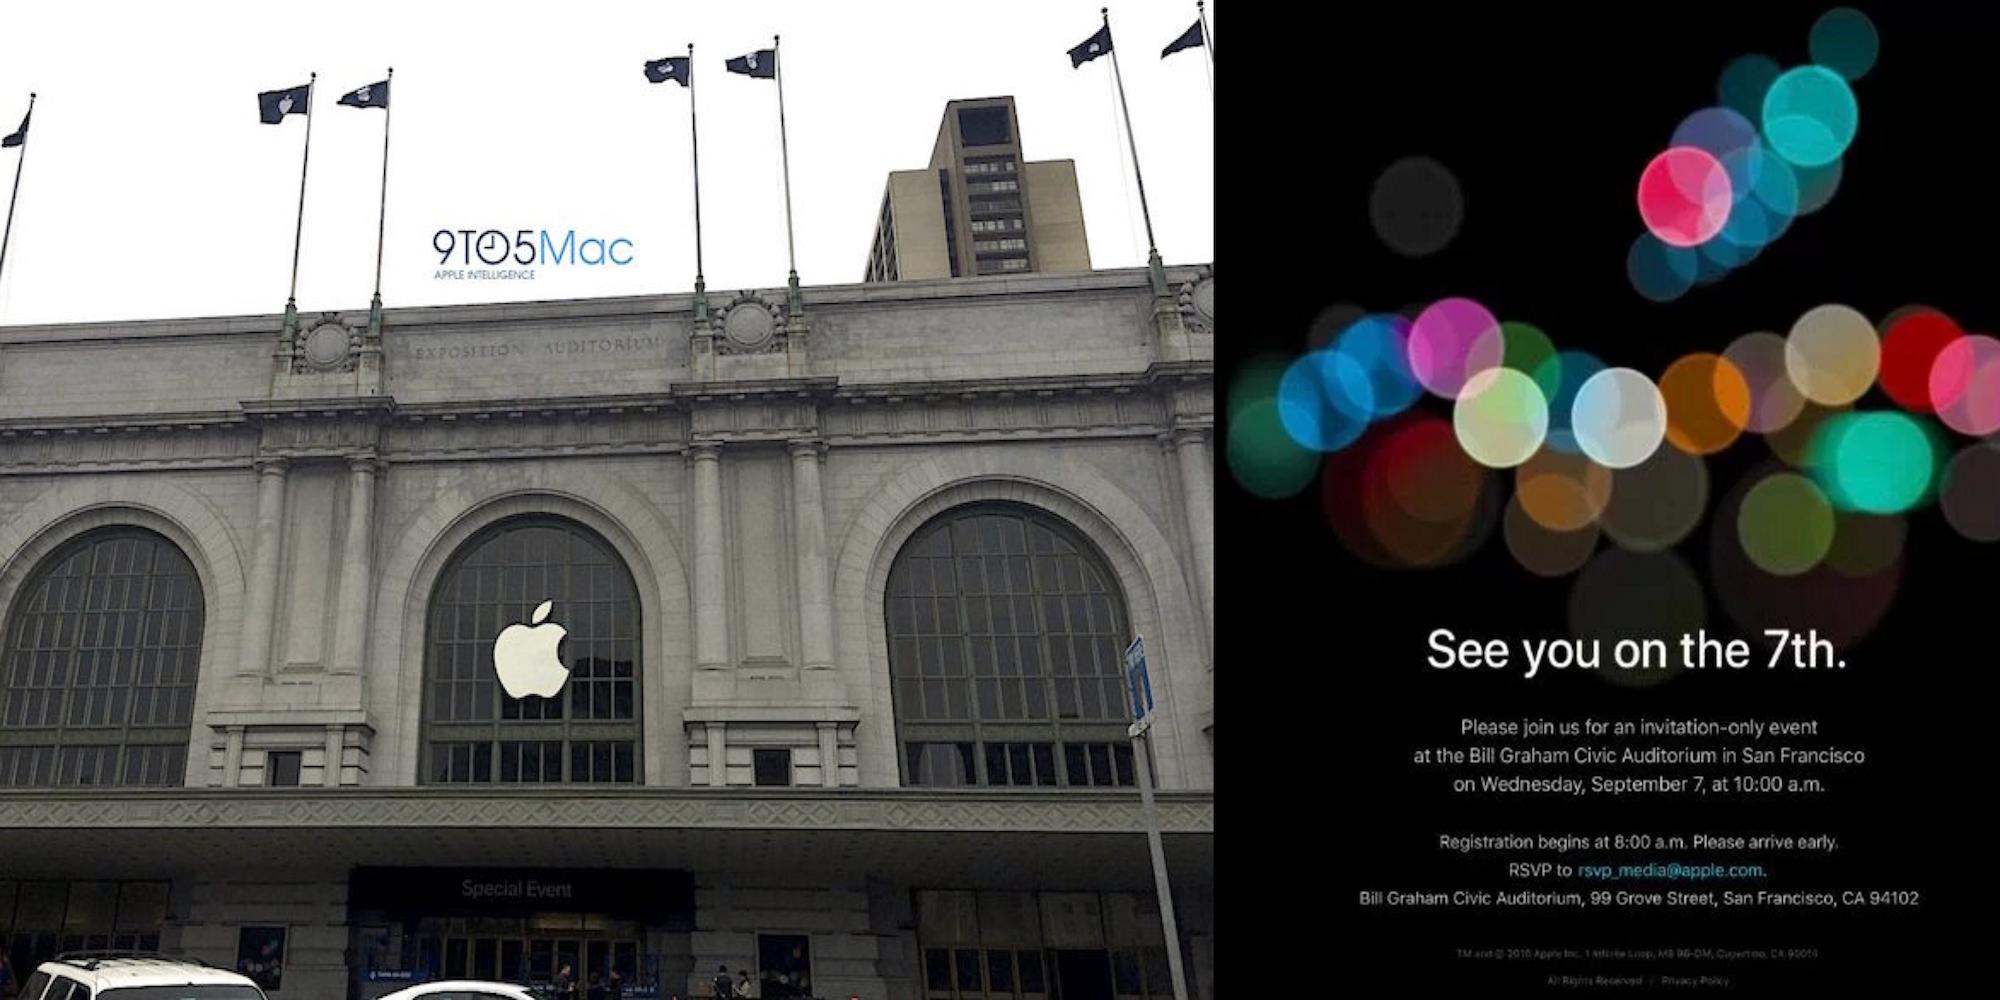 apple-iphone-7-live-blog-news-hub-9to5mac-sept-7